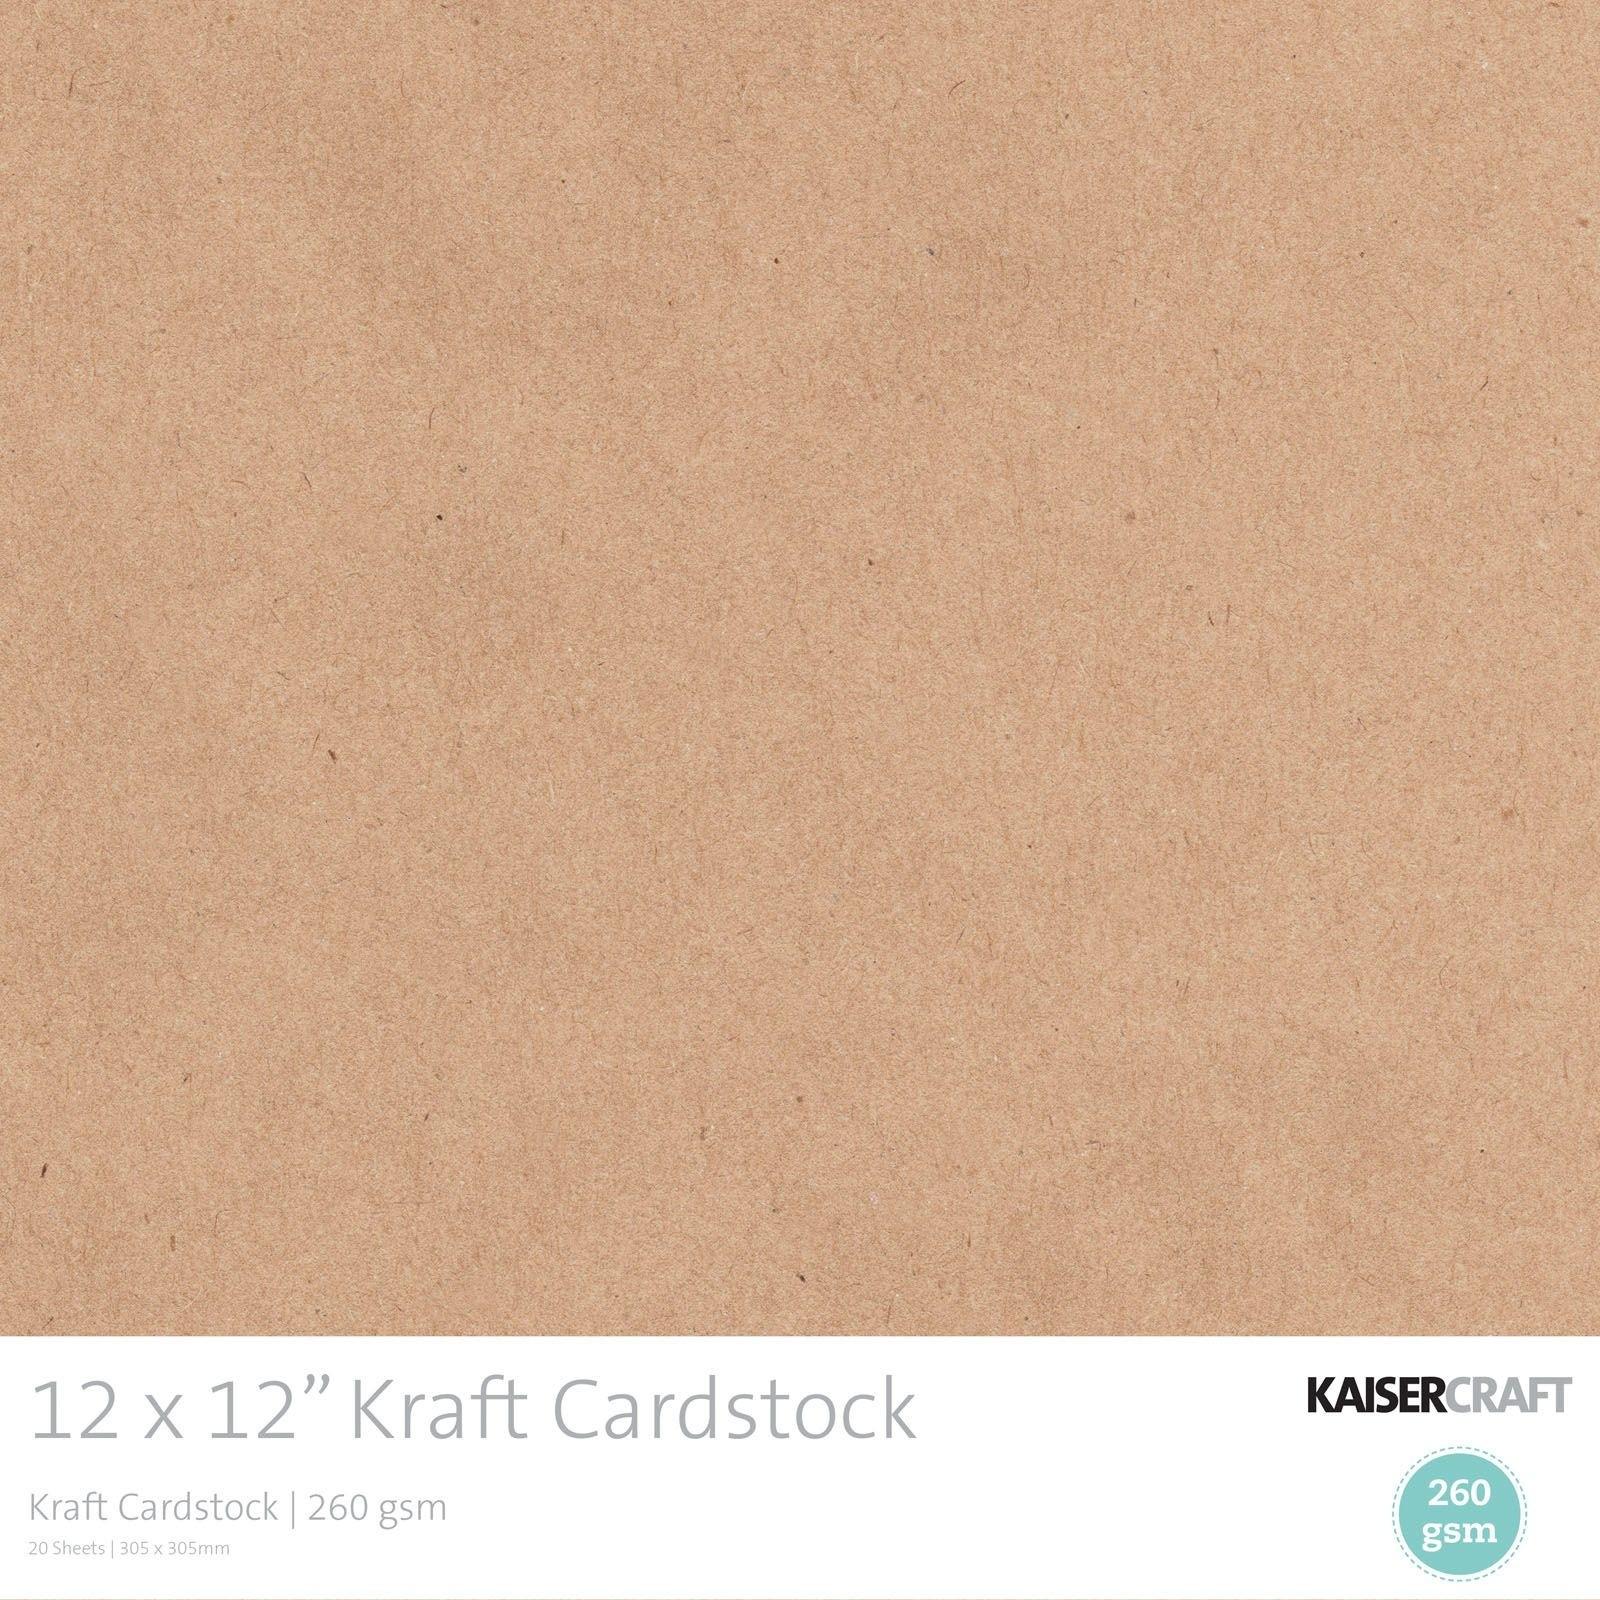 Kaisercraft - Kraft cardstock 30.5x30.5cm 20pcs